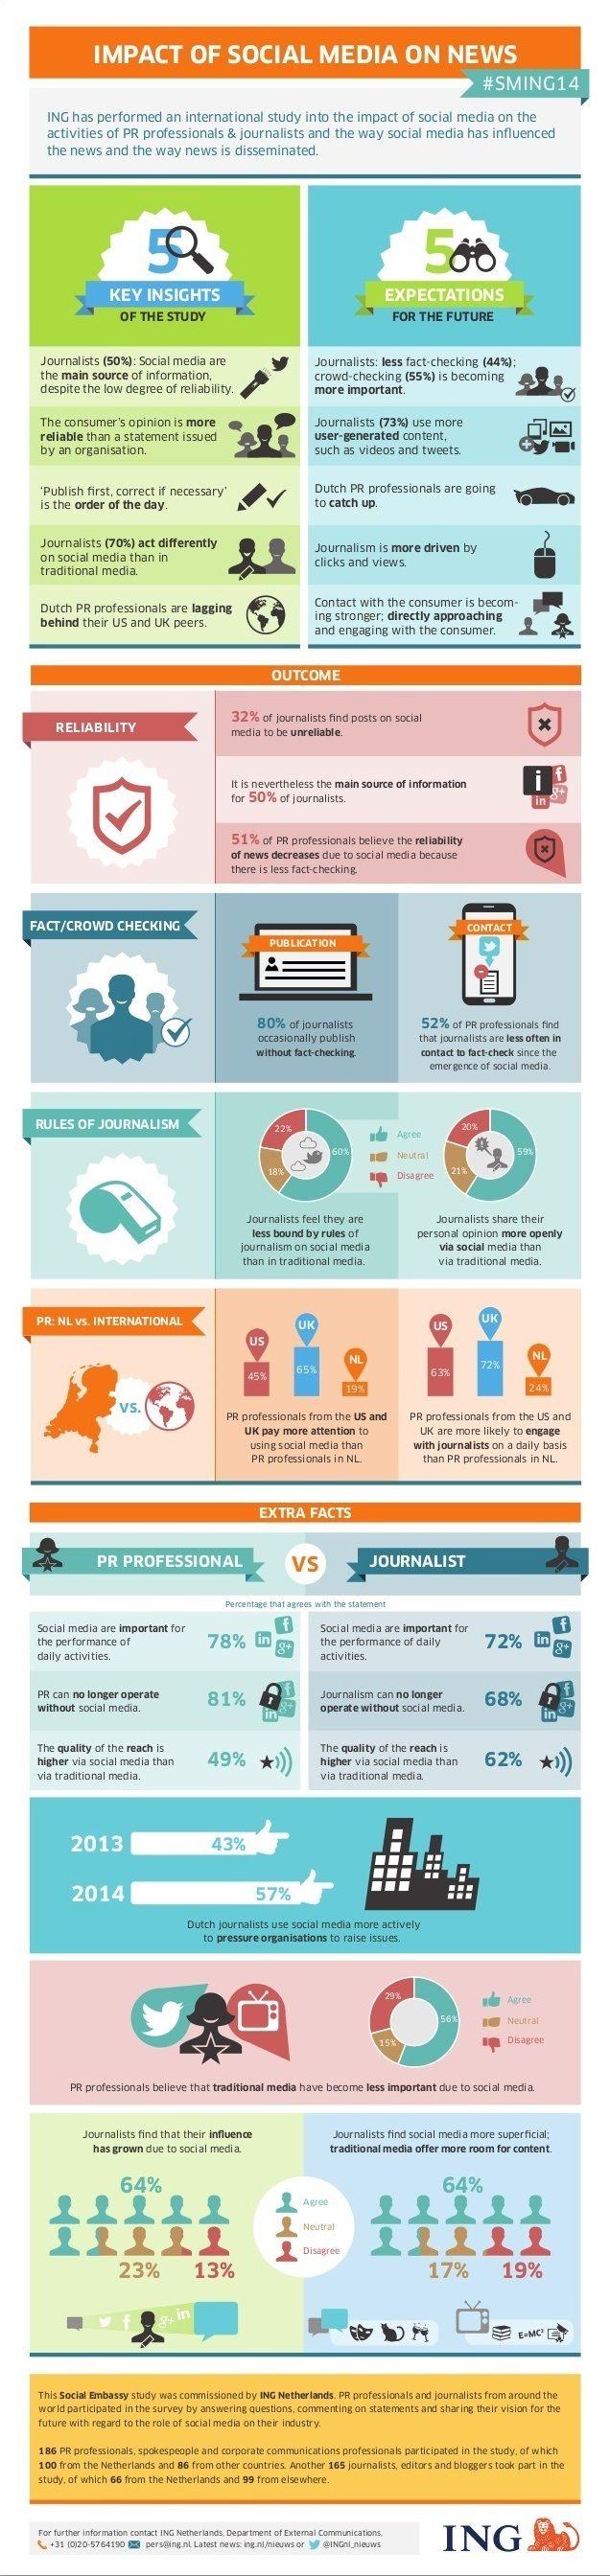 infografia_impact_social_media_news_ligateamedia